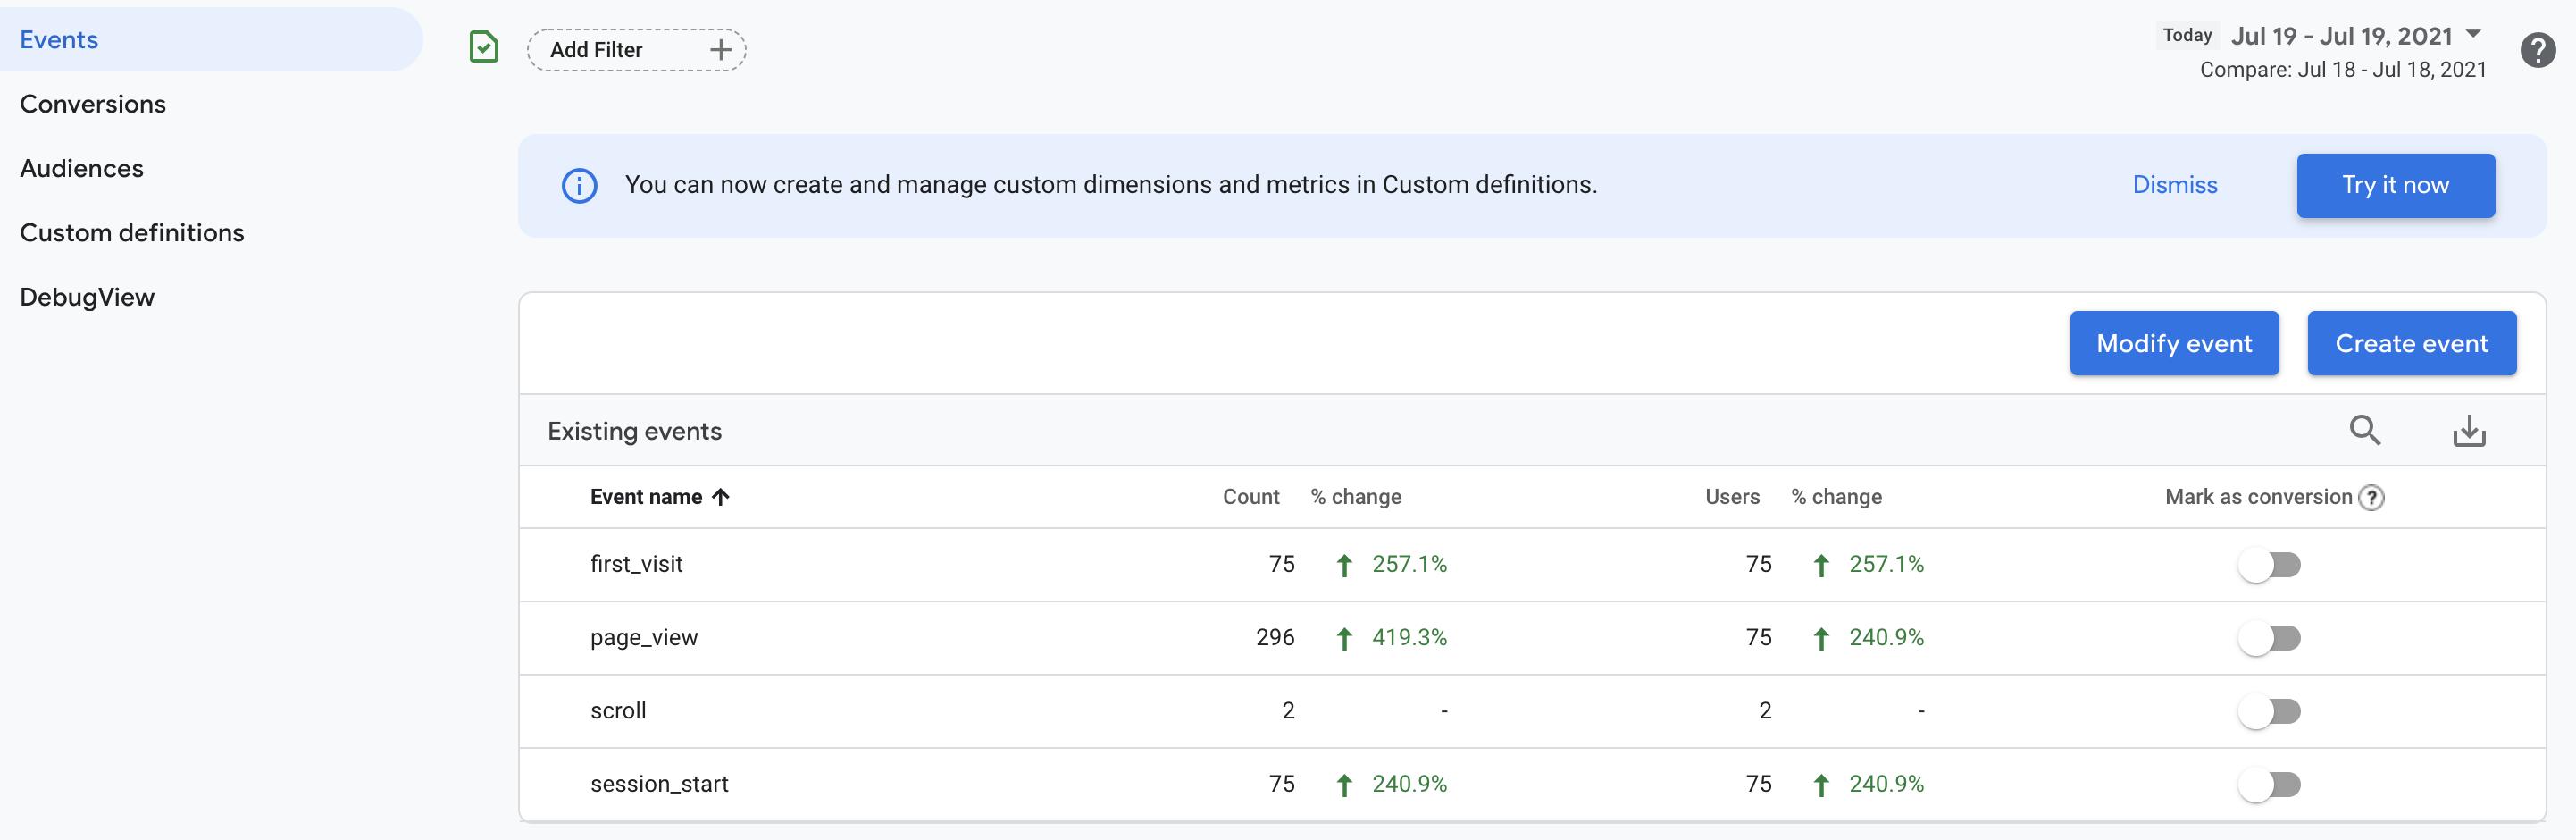 Event configuration screen in google analytics 4.